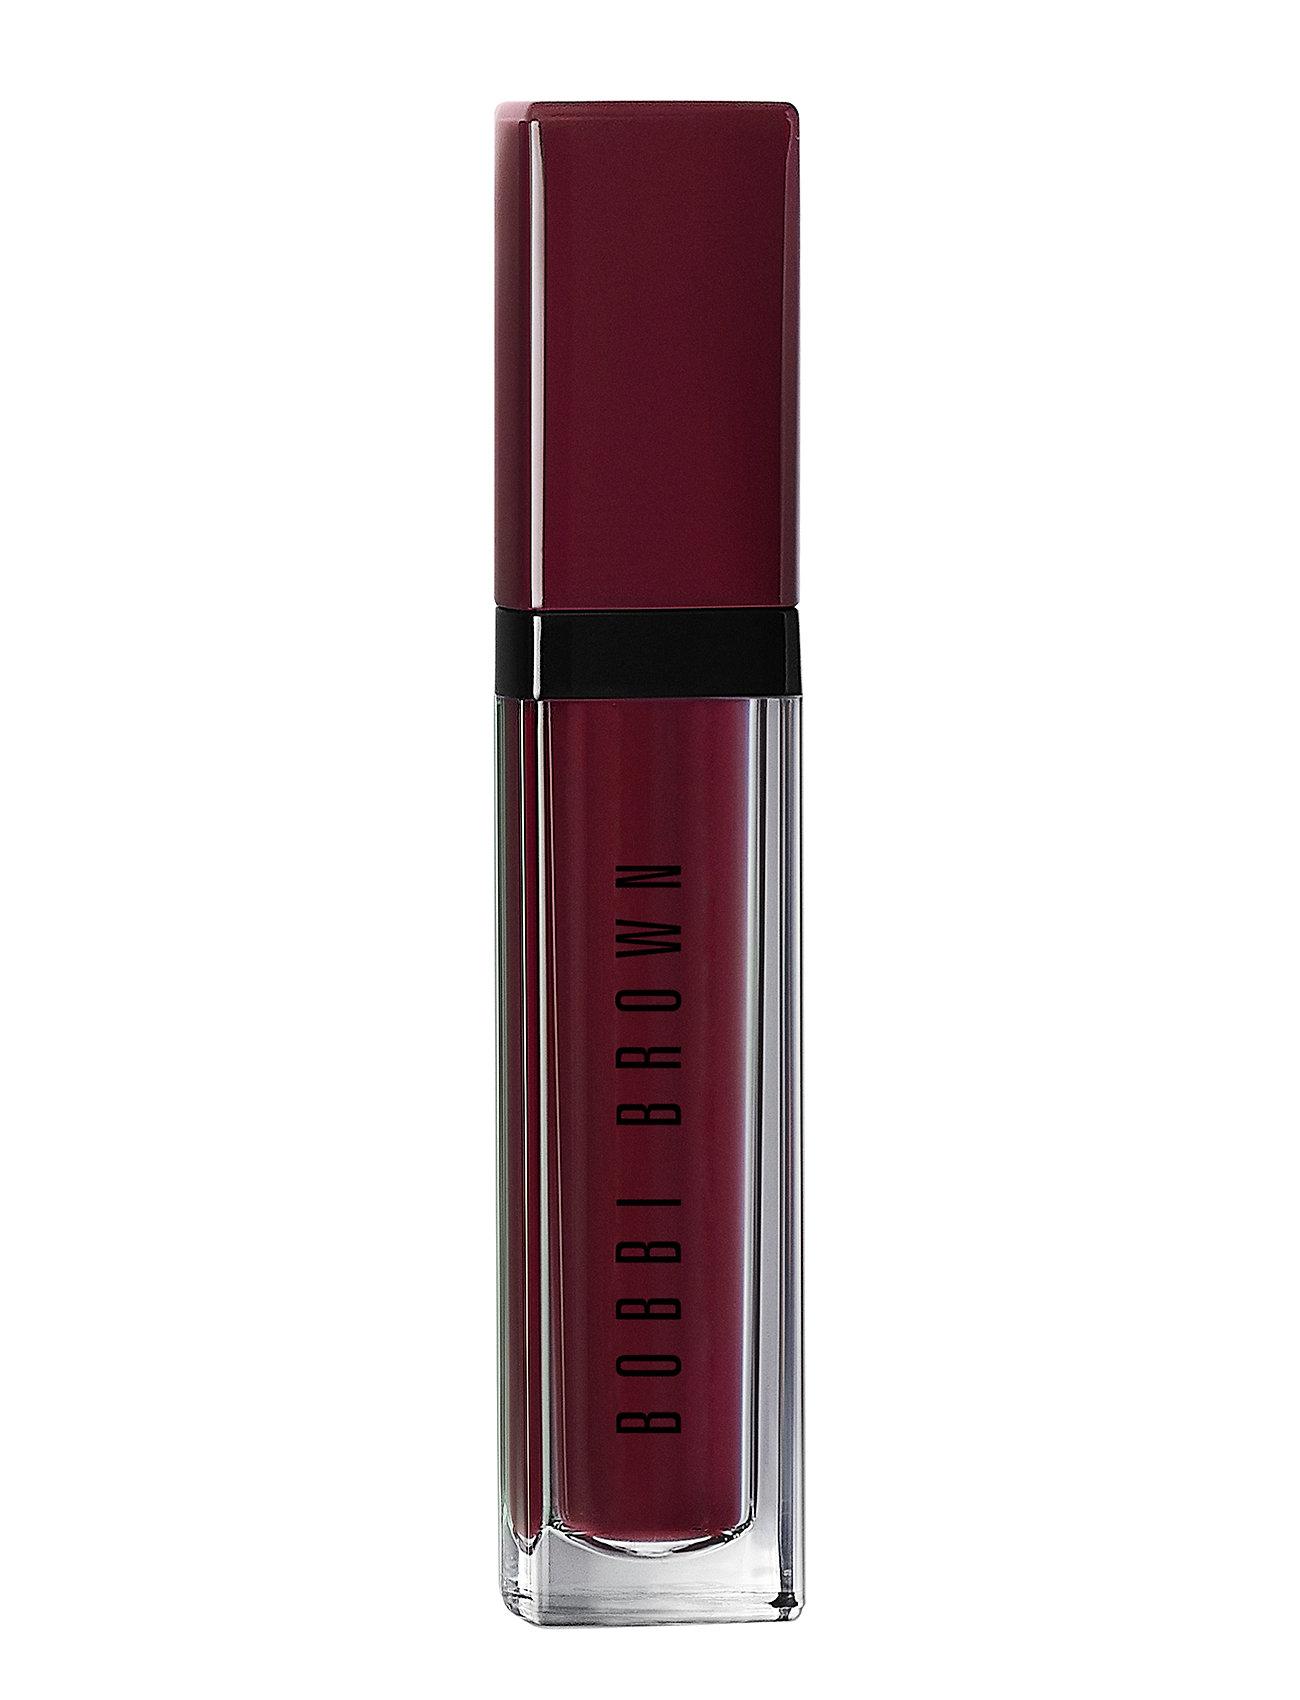 Image of Crushed Liquid Lipgloss Makeup Rød Bobbi Brown (3431130877)